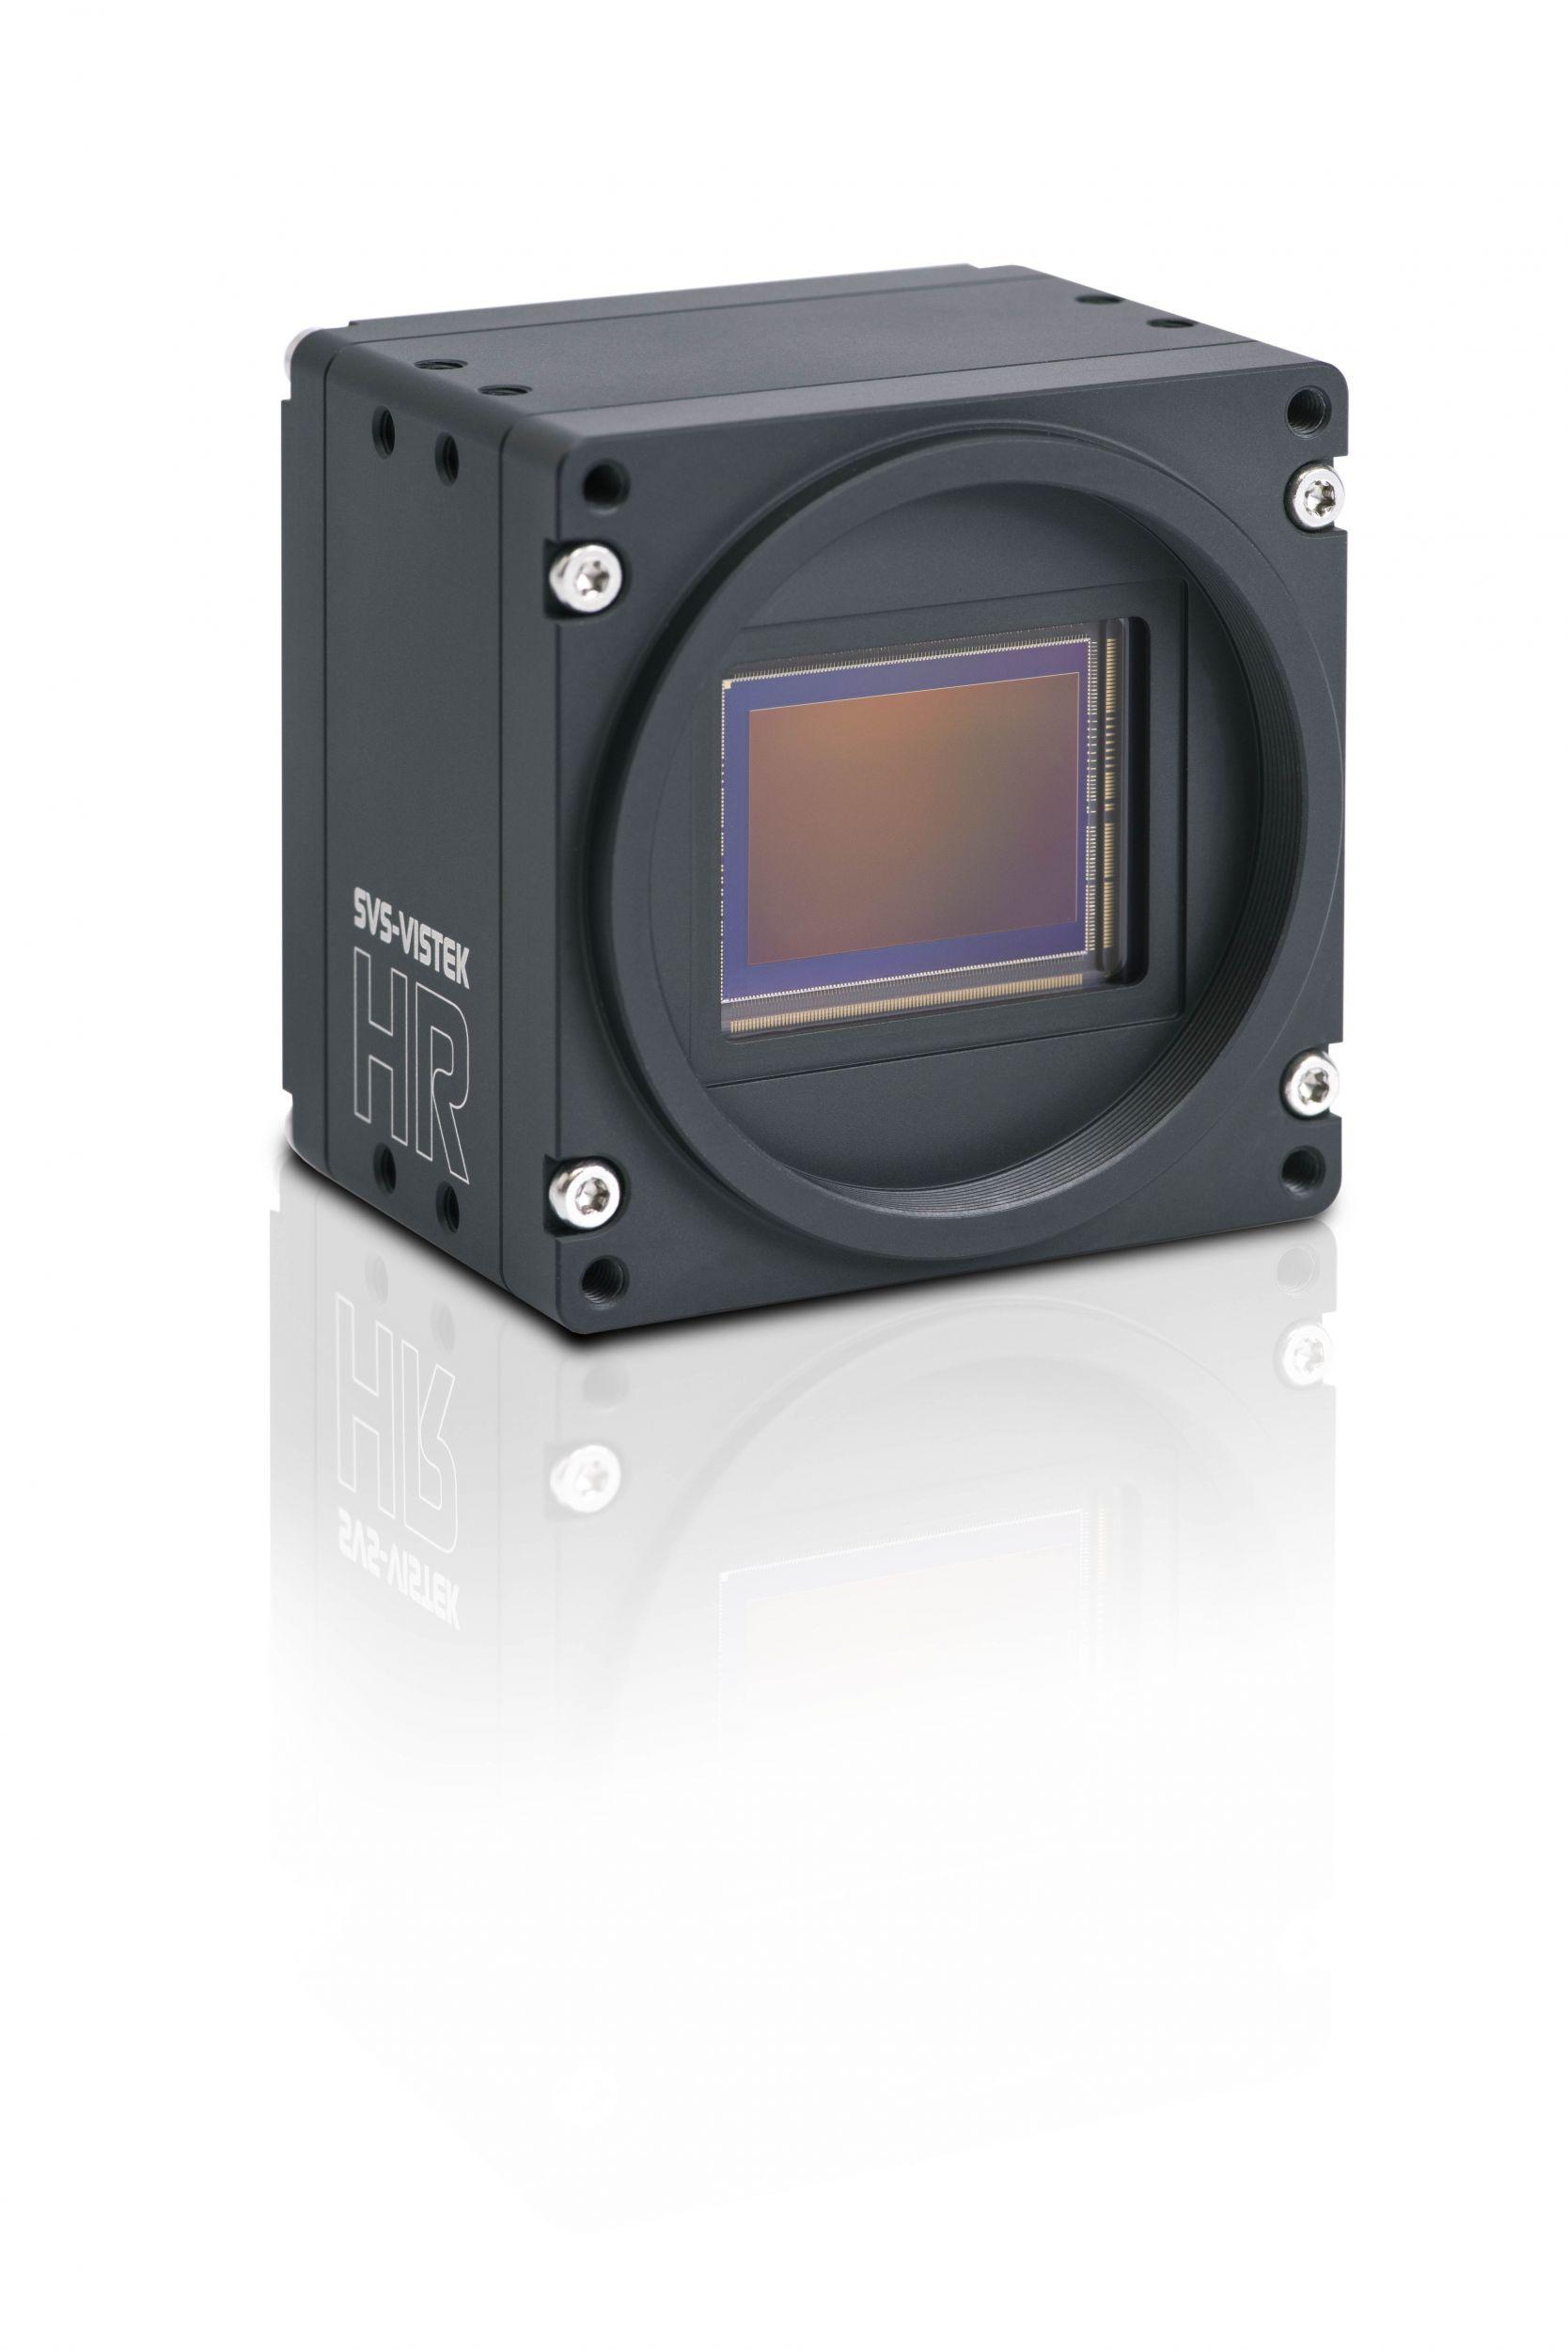 120mp kamera mit 6 7fps invision bildverarbeitung. Black Bedroom Furniture Sets. Home Design Ideas